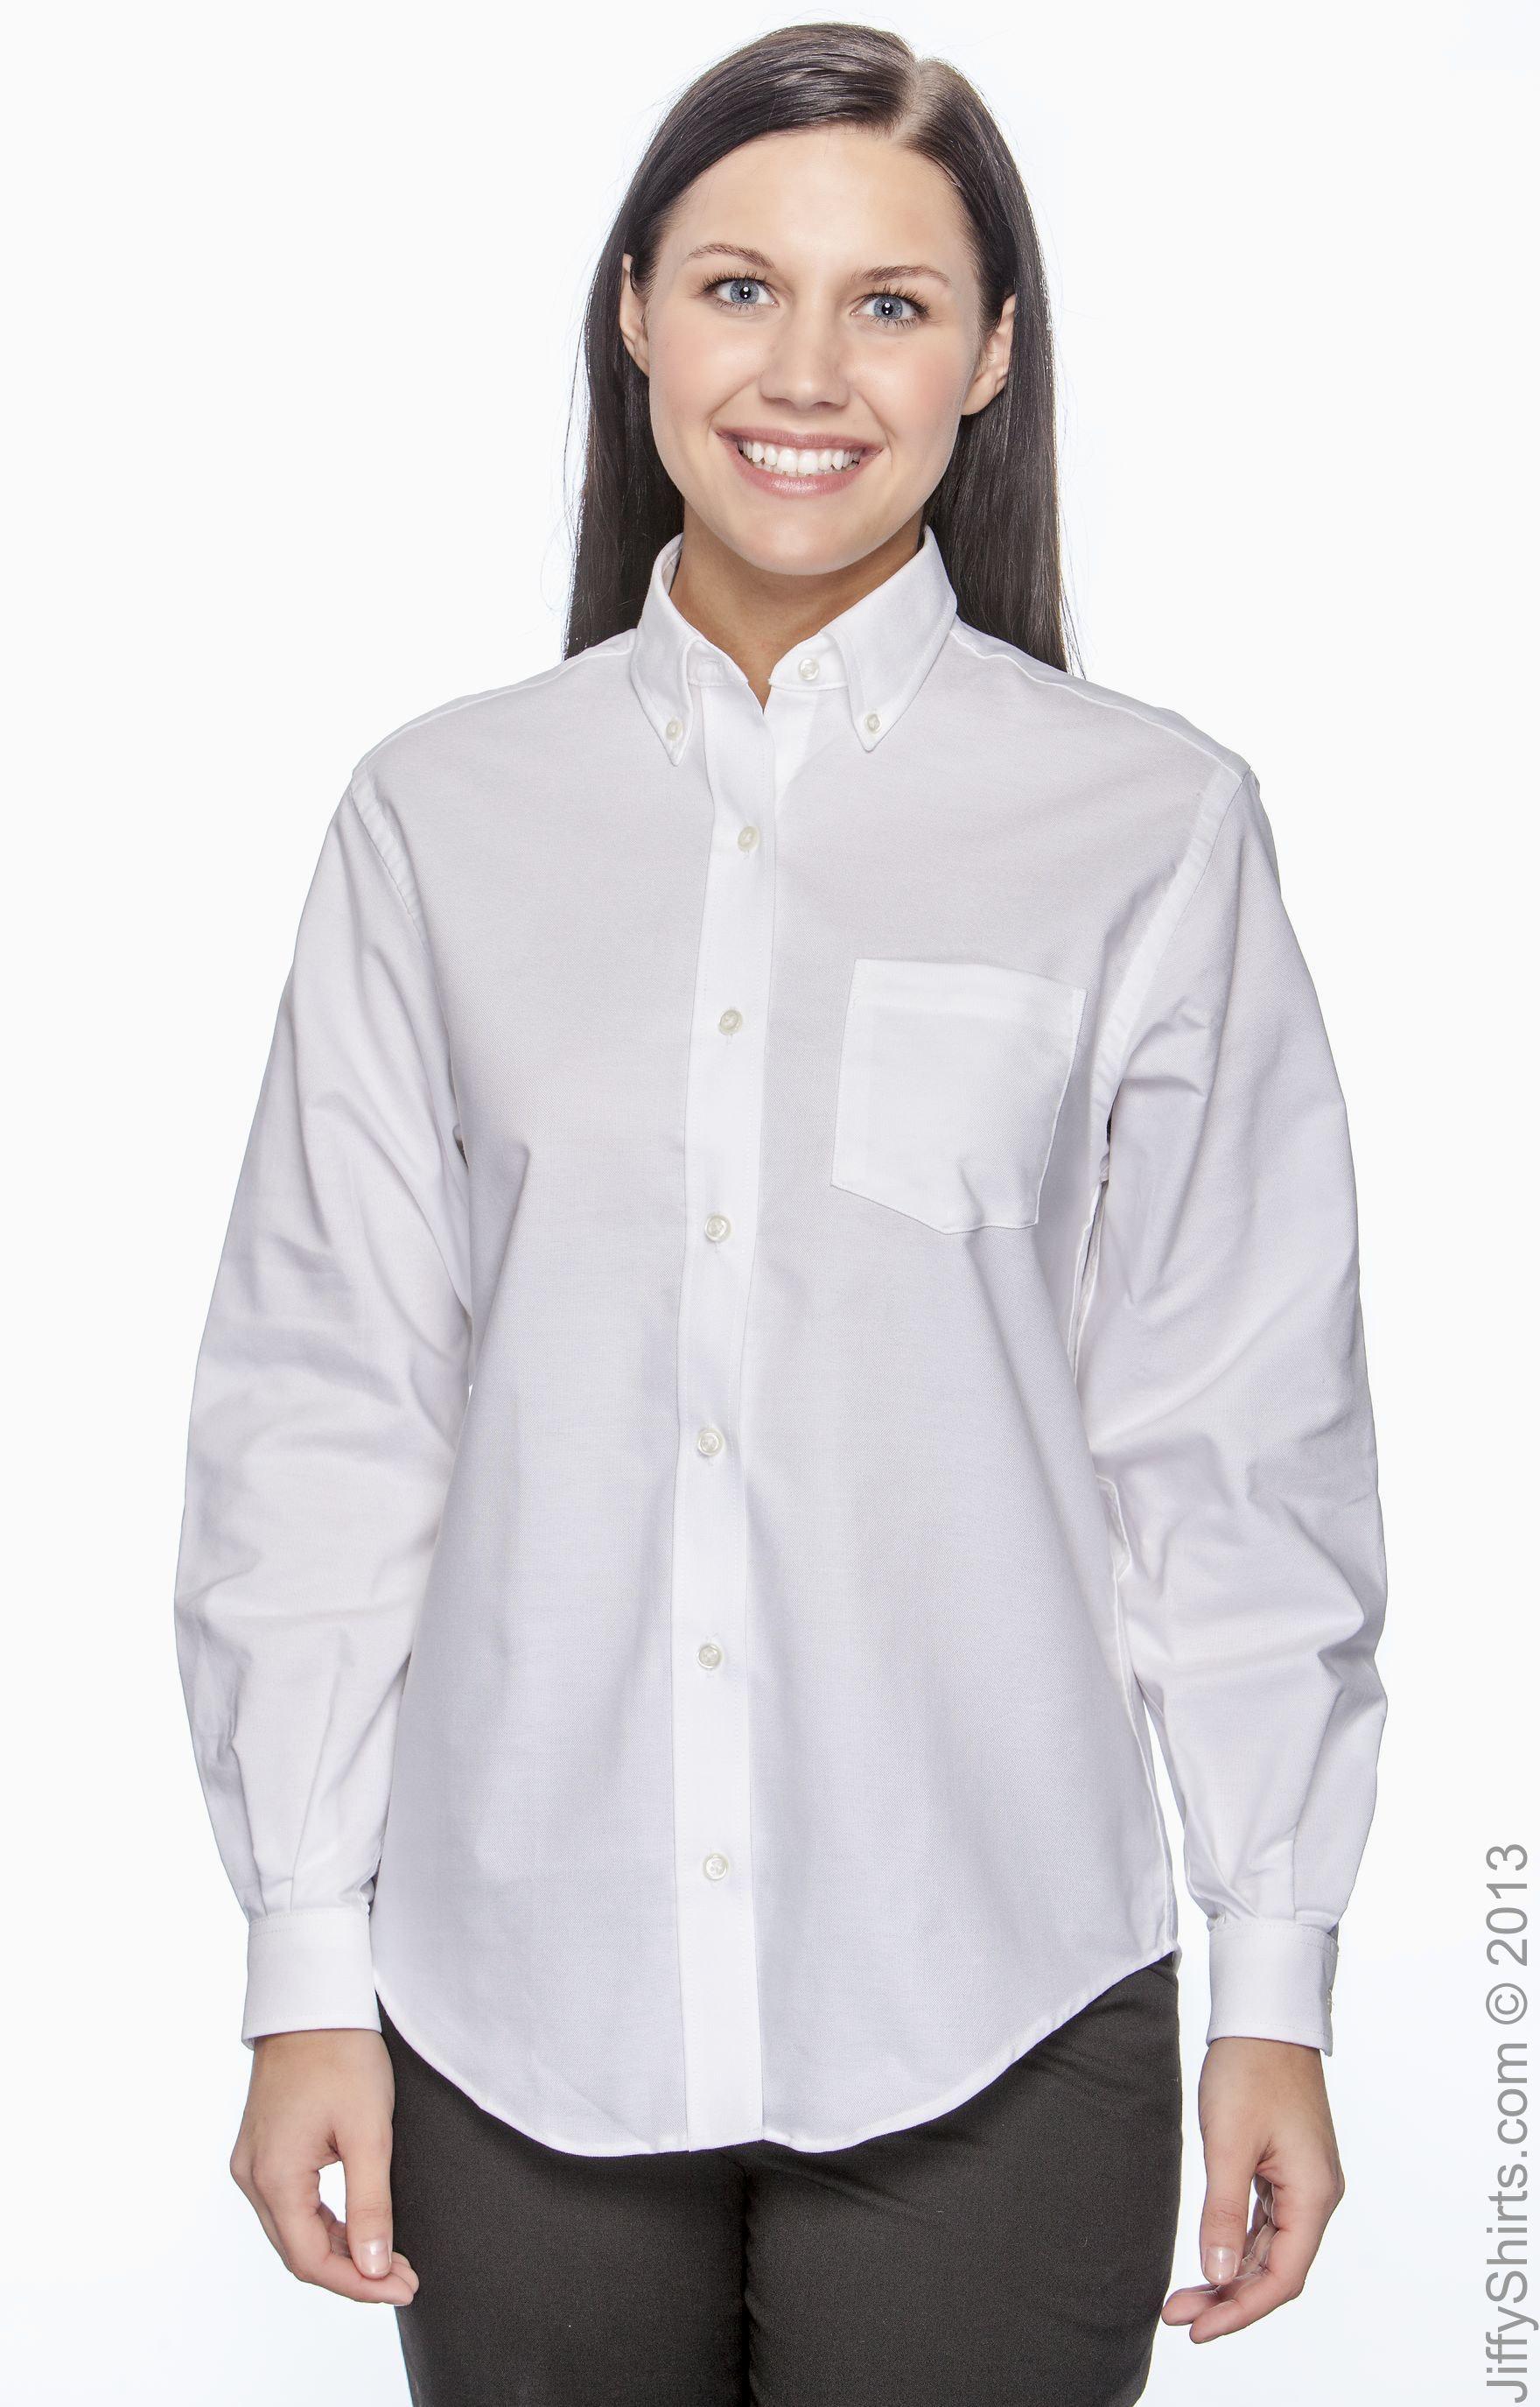 Van Heusen 59800 White